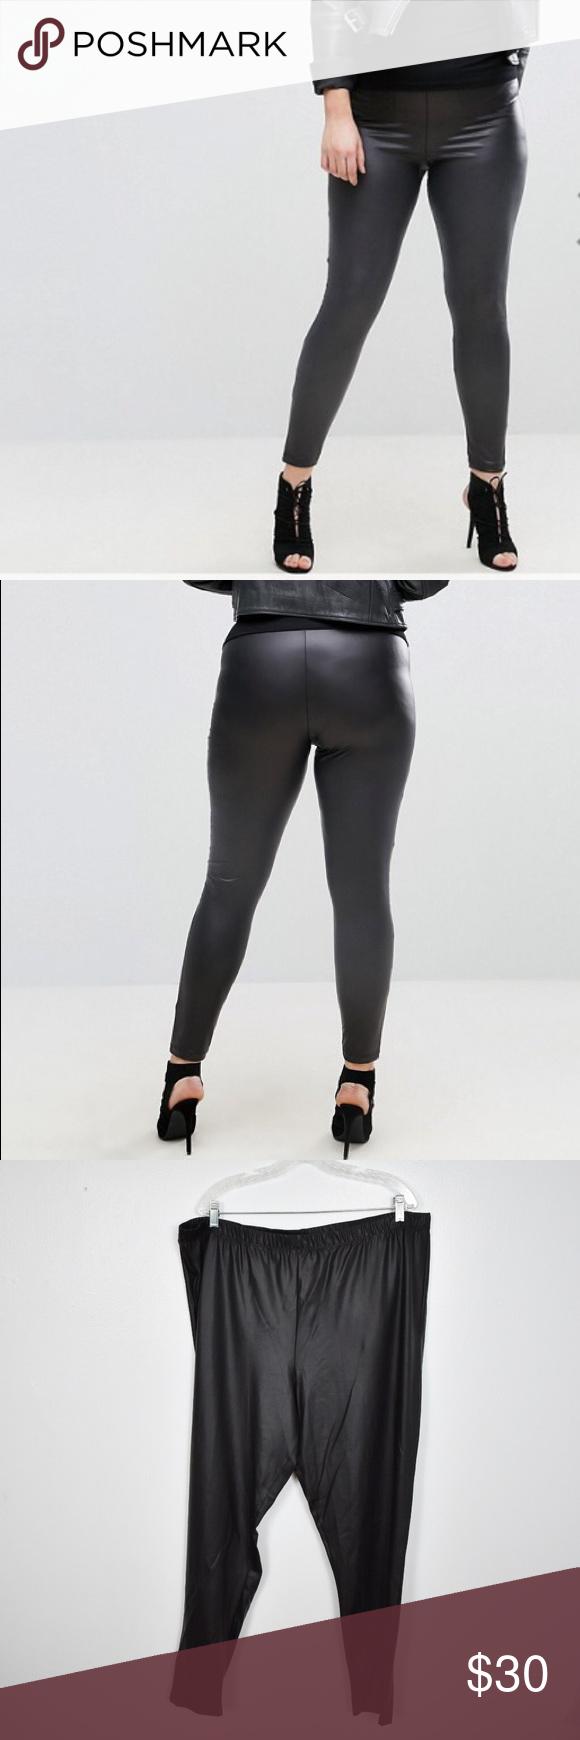 6e7de759d43490 ASOS Curve Leather Look Leggings NEW size 22 ASOS Curve Leather Look  Leggings NEW size 22